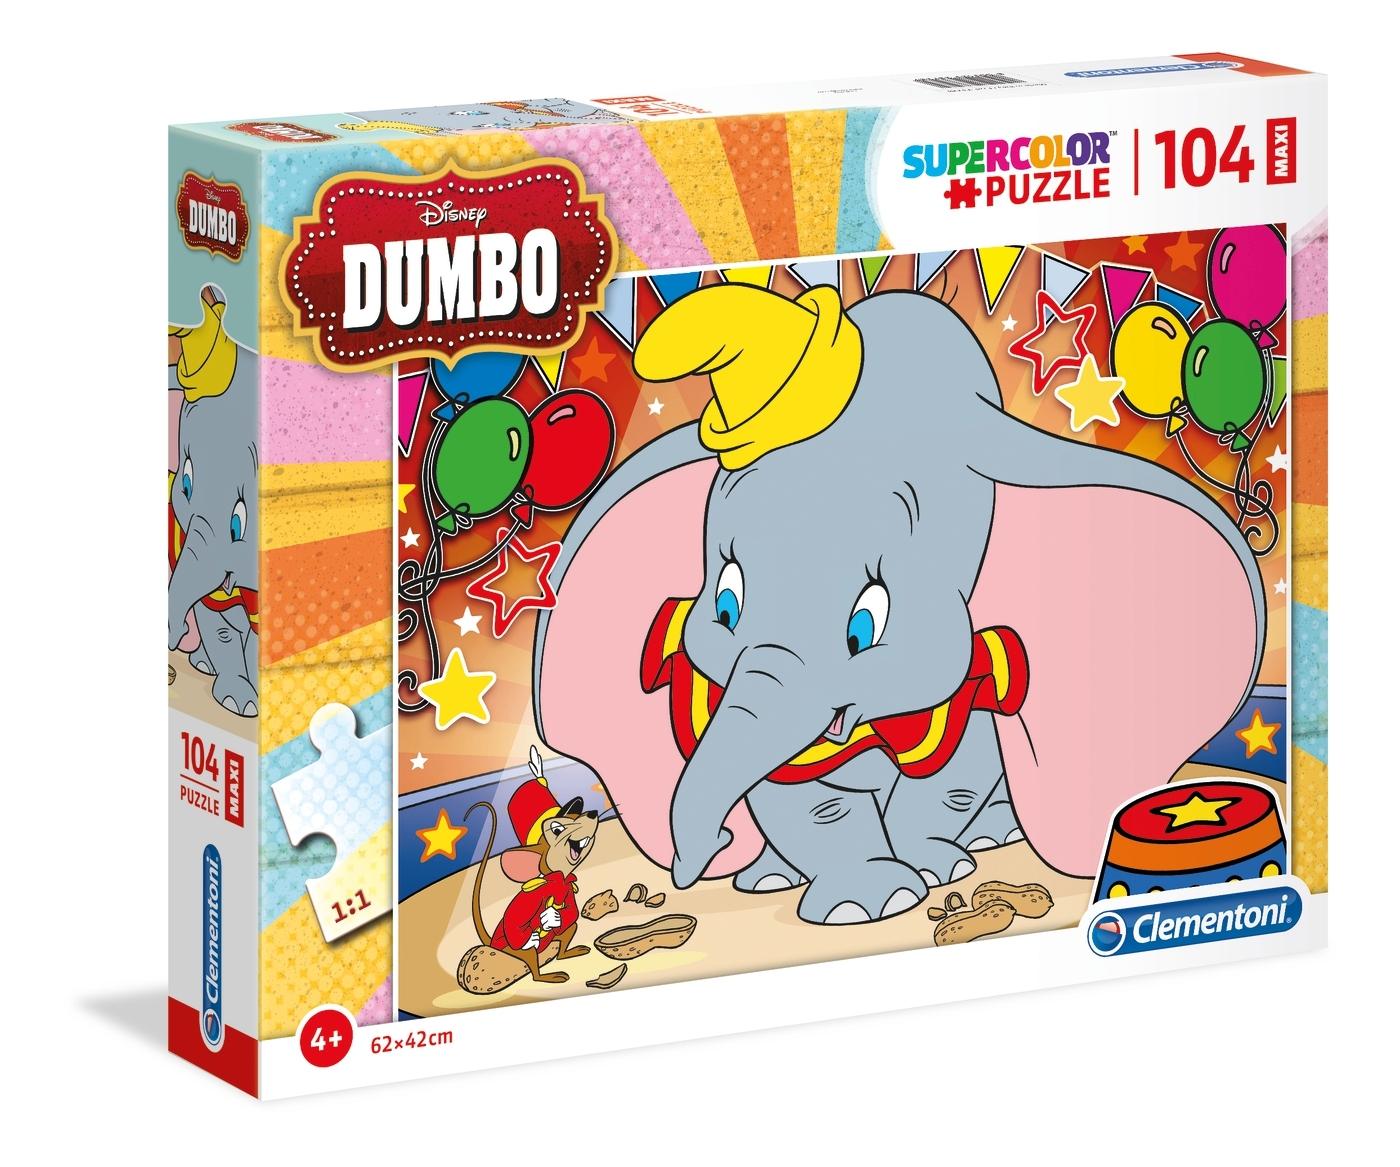 Puzzle Maxi Supercolor 104: Dumbo (23728)